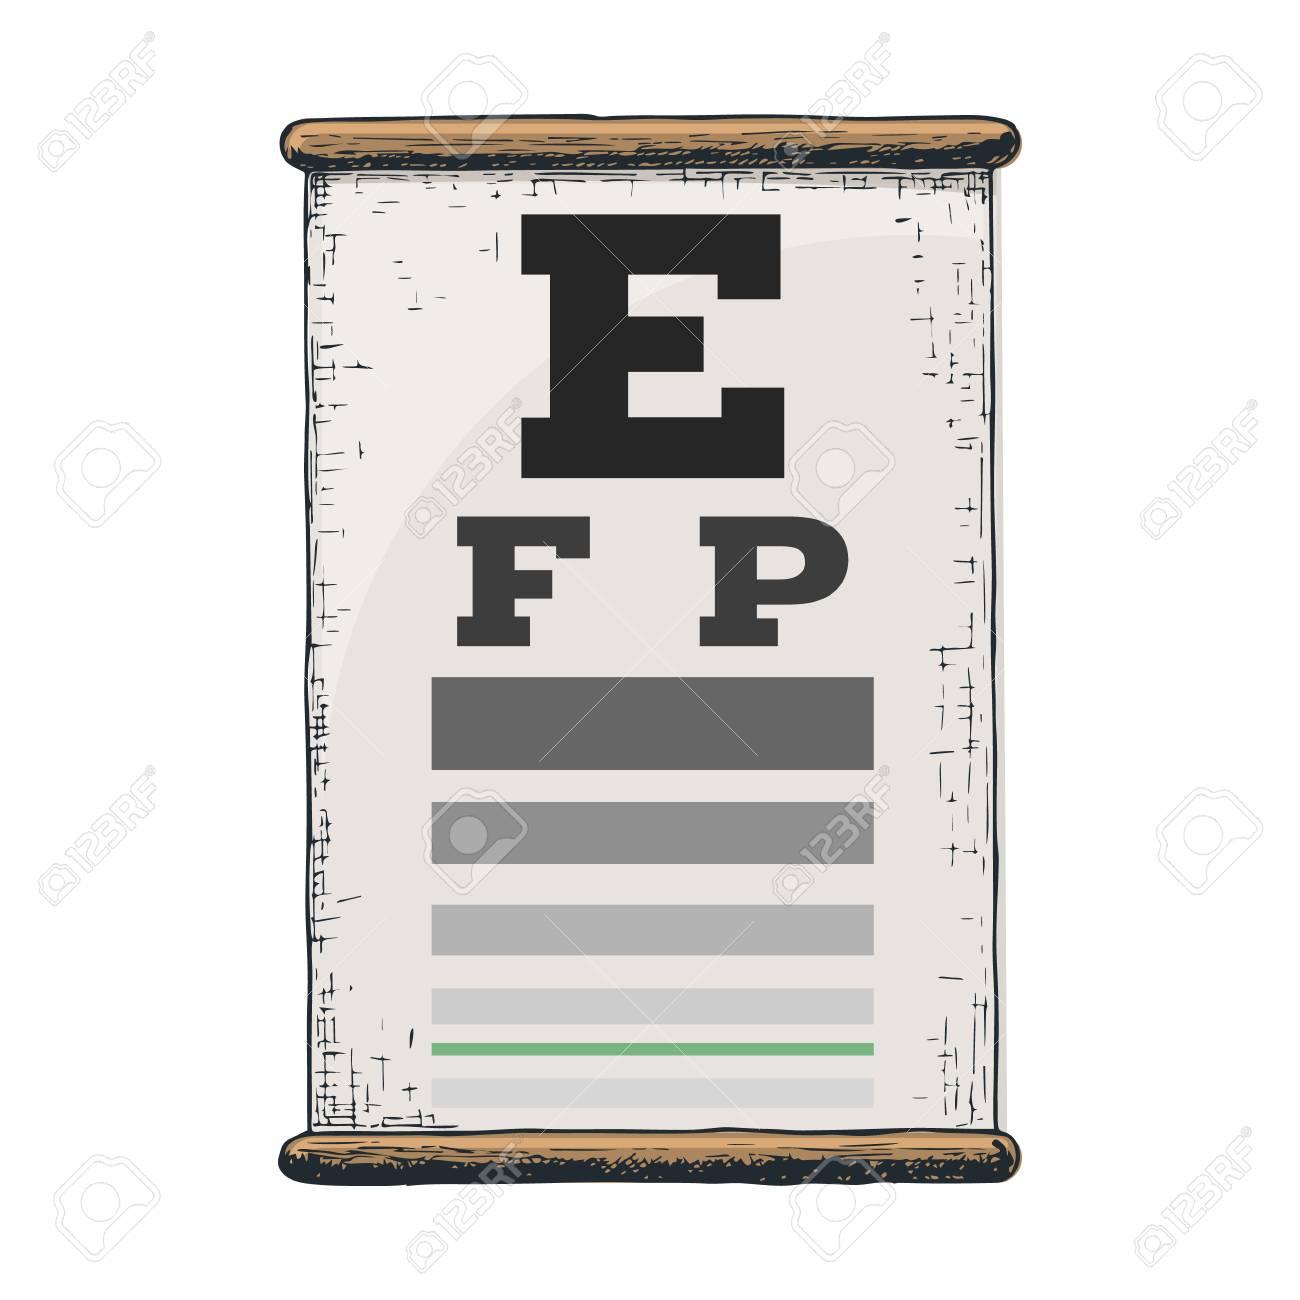 Eye Vision Test Poor Eyesight Myopia Diagnostic On Snellen Eye